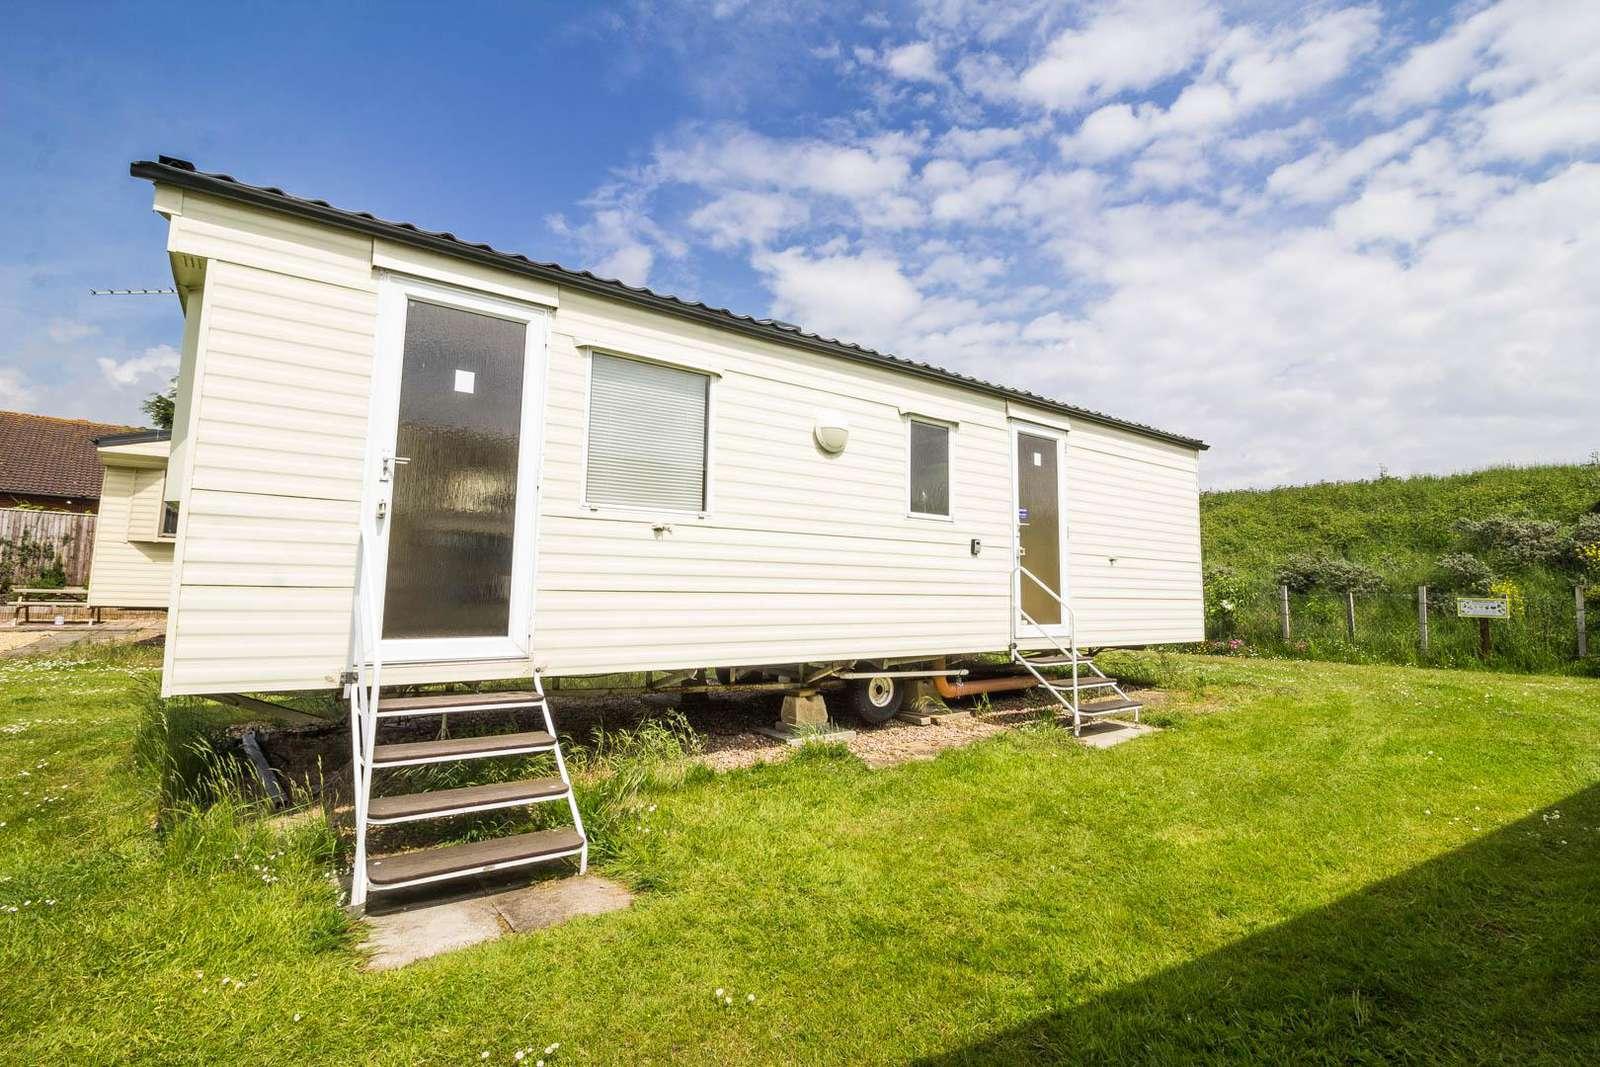 35225S – Sunnydale, 2 bed, 4 berth caravan. Emerald rated. - property